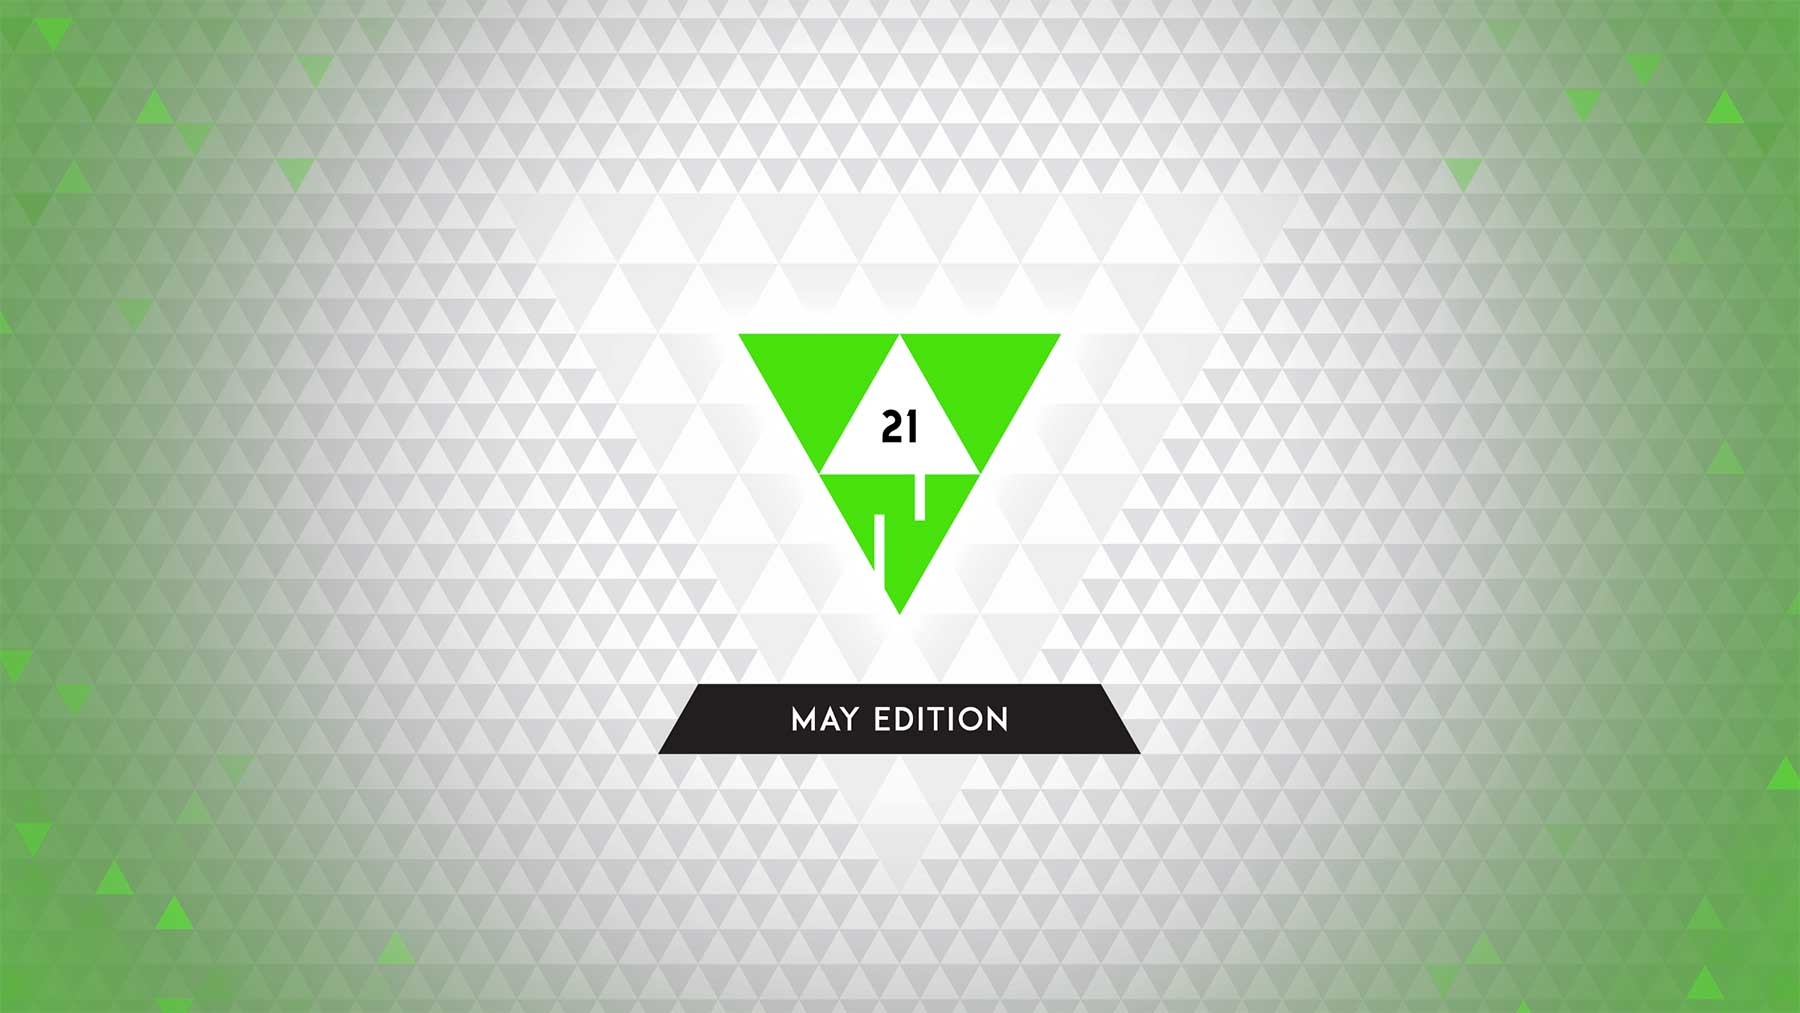 WIN Compilation Mai 2021 WIN-Compilation-MAI-2021